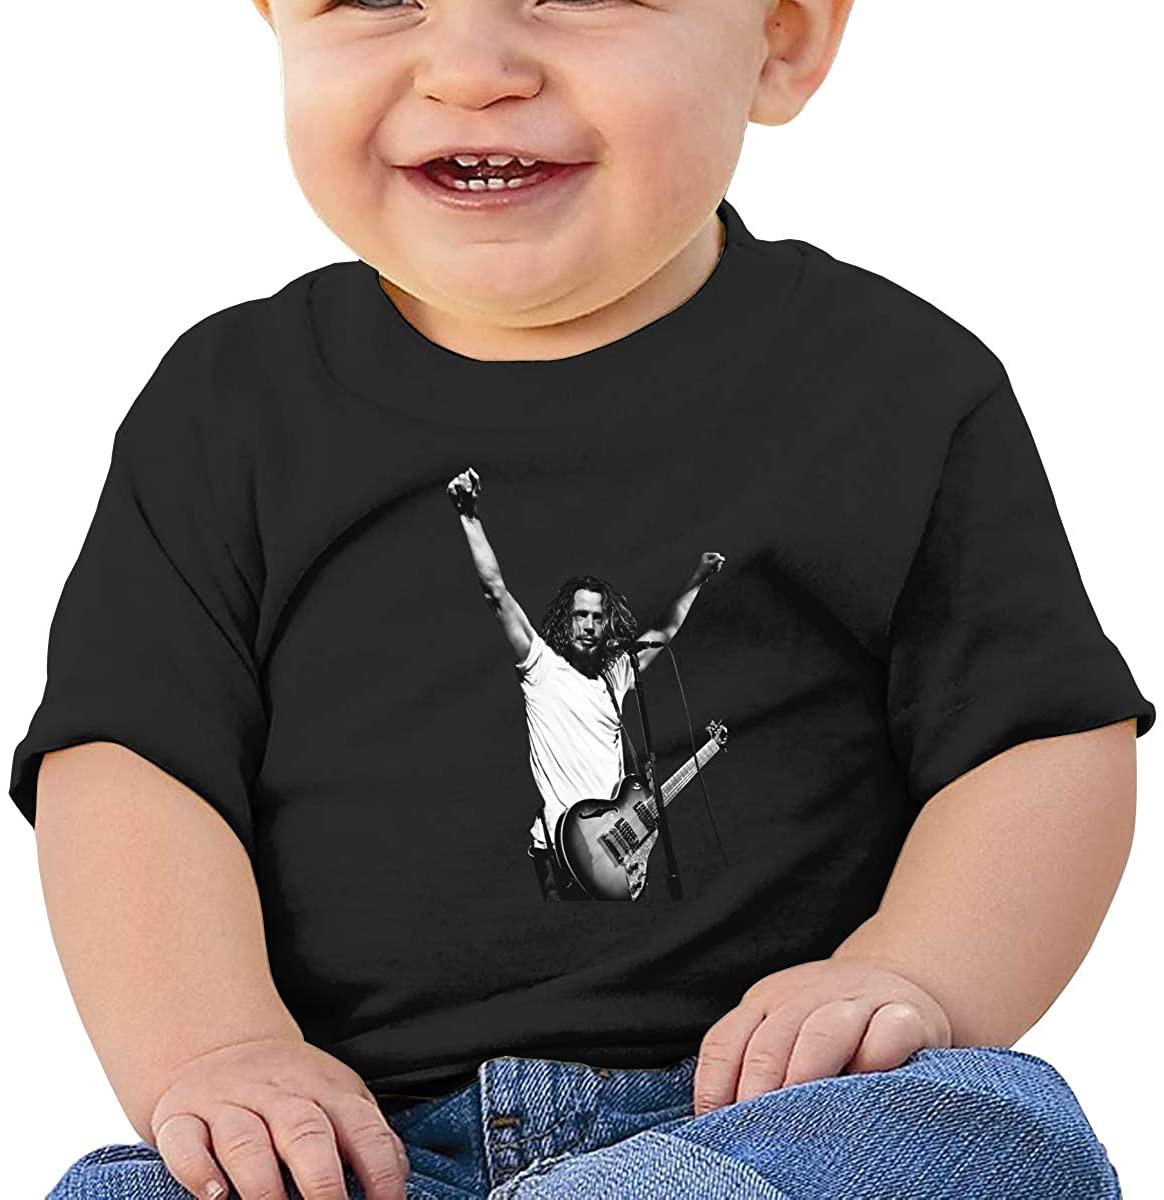 Boy's T-Shirt,Chris Cornell Short Sleeve Round Neck T-Shirt, 100% Organic Cotton.